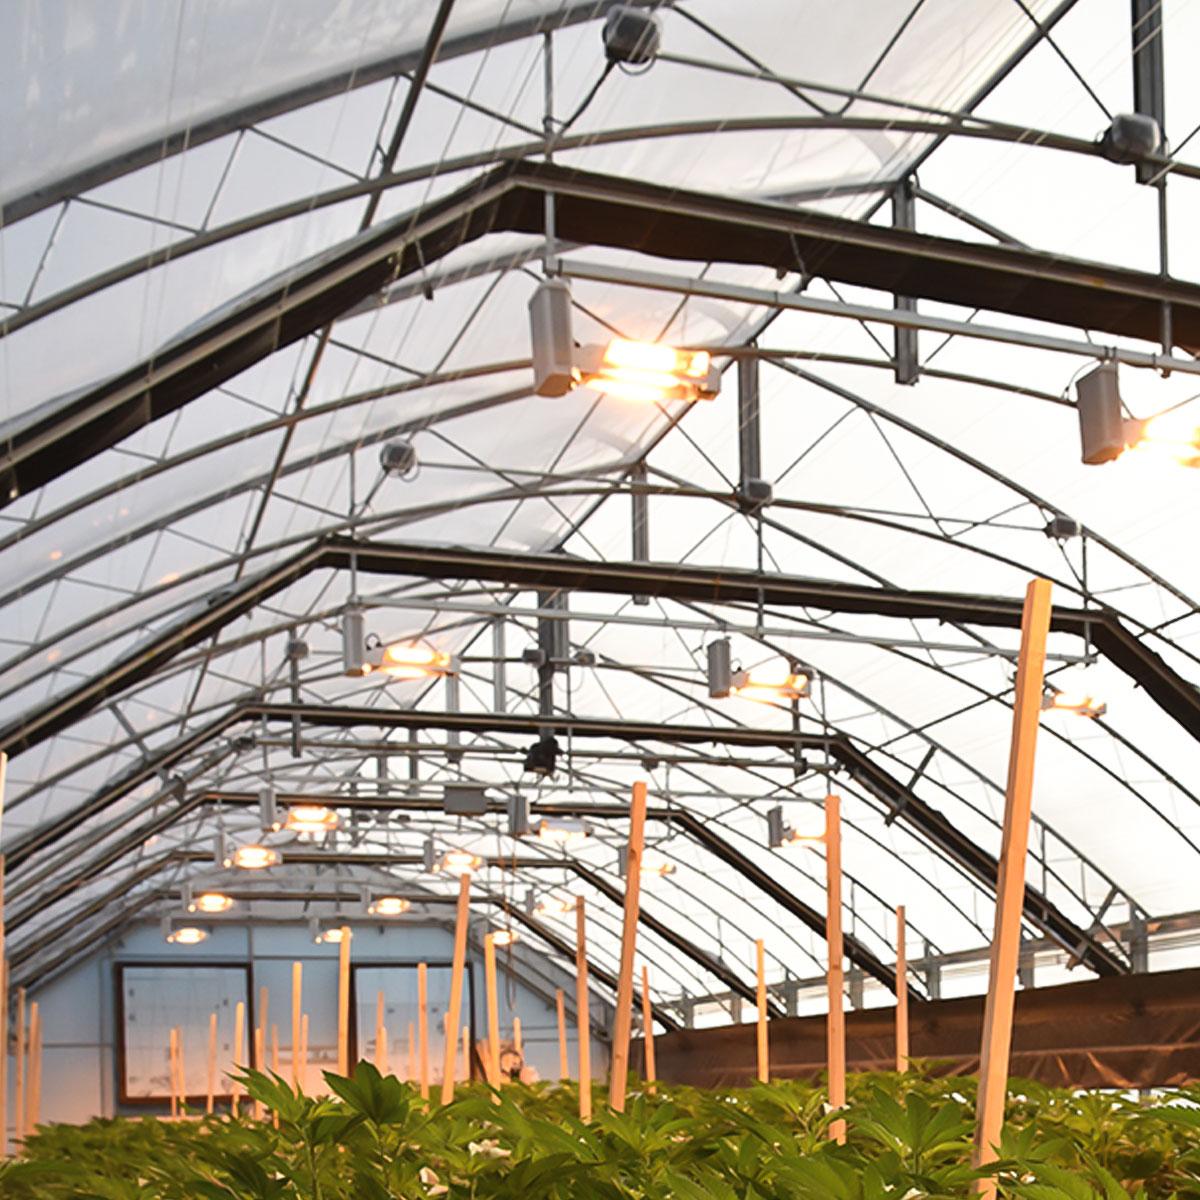 Engineered Blackout Greenhouse - Guardian Series | fullbloomlightdep.com